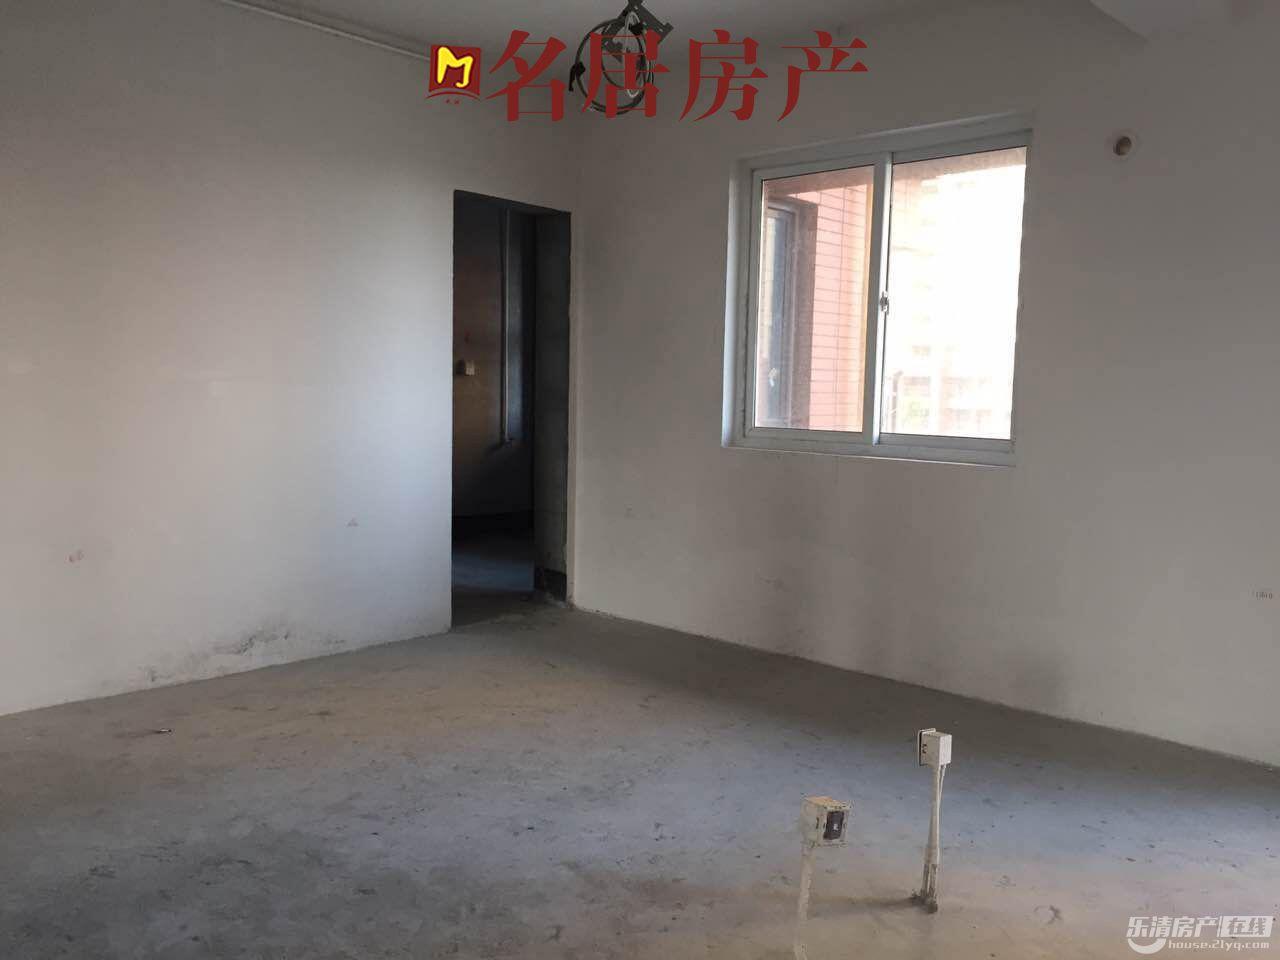 http://house.21yq.com/userfiles/image/20161209/091414184b03f260ff8430.jpg